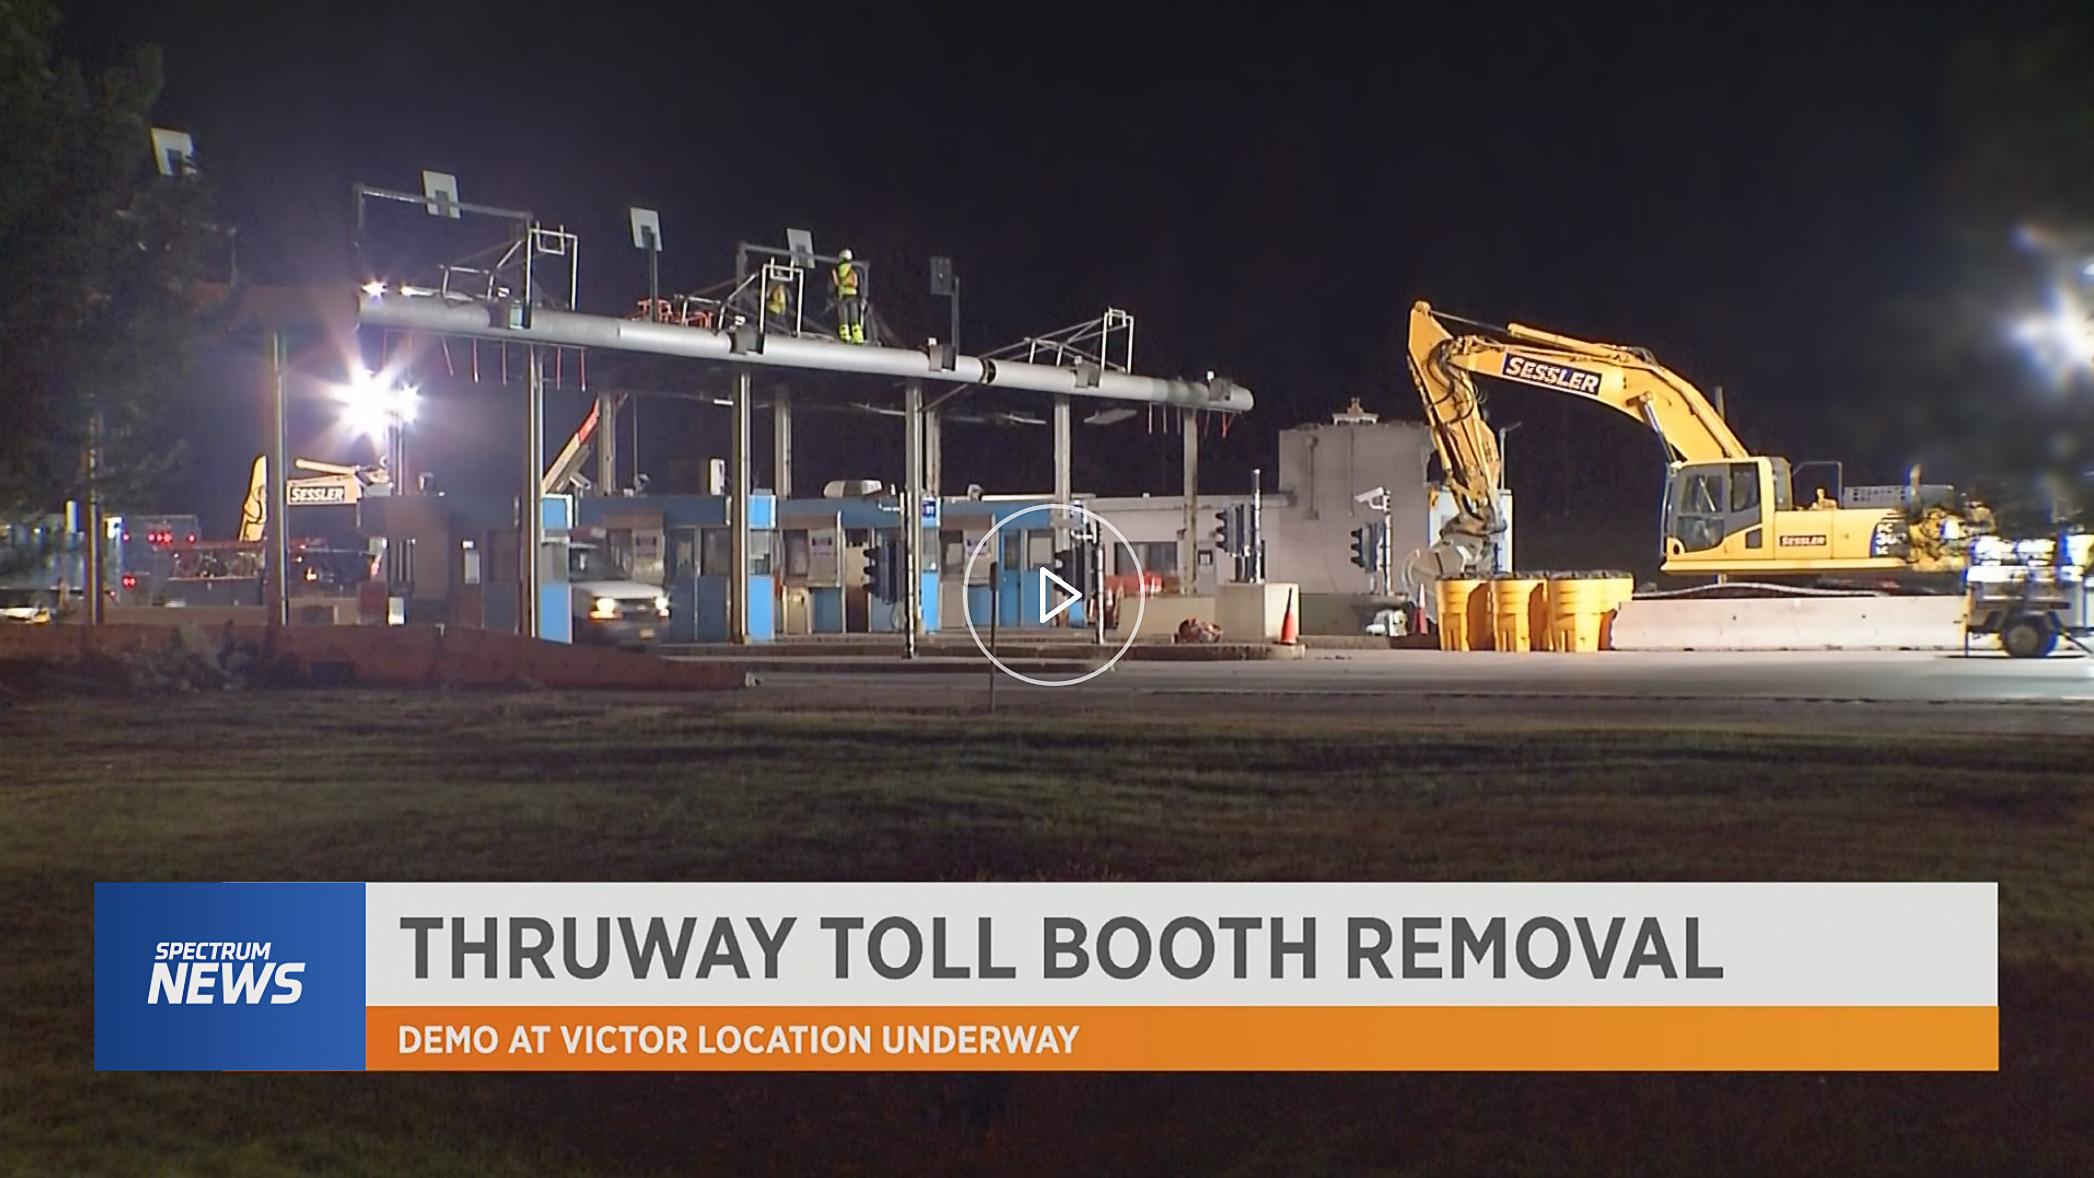 Demolition Thruway Toll Booths Begins Victor Sessler Wrecking